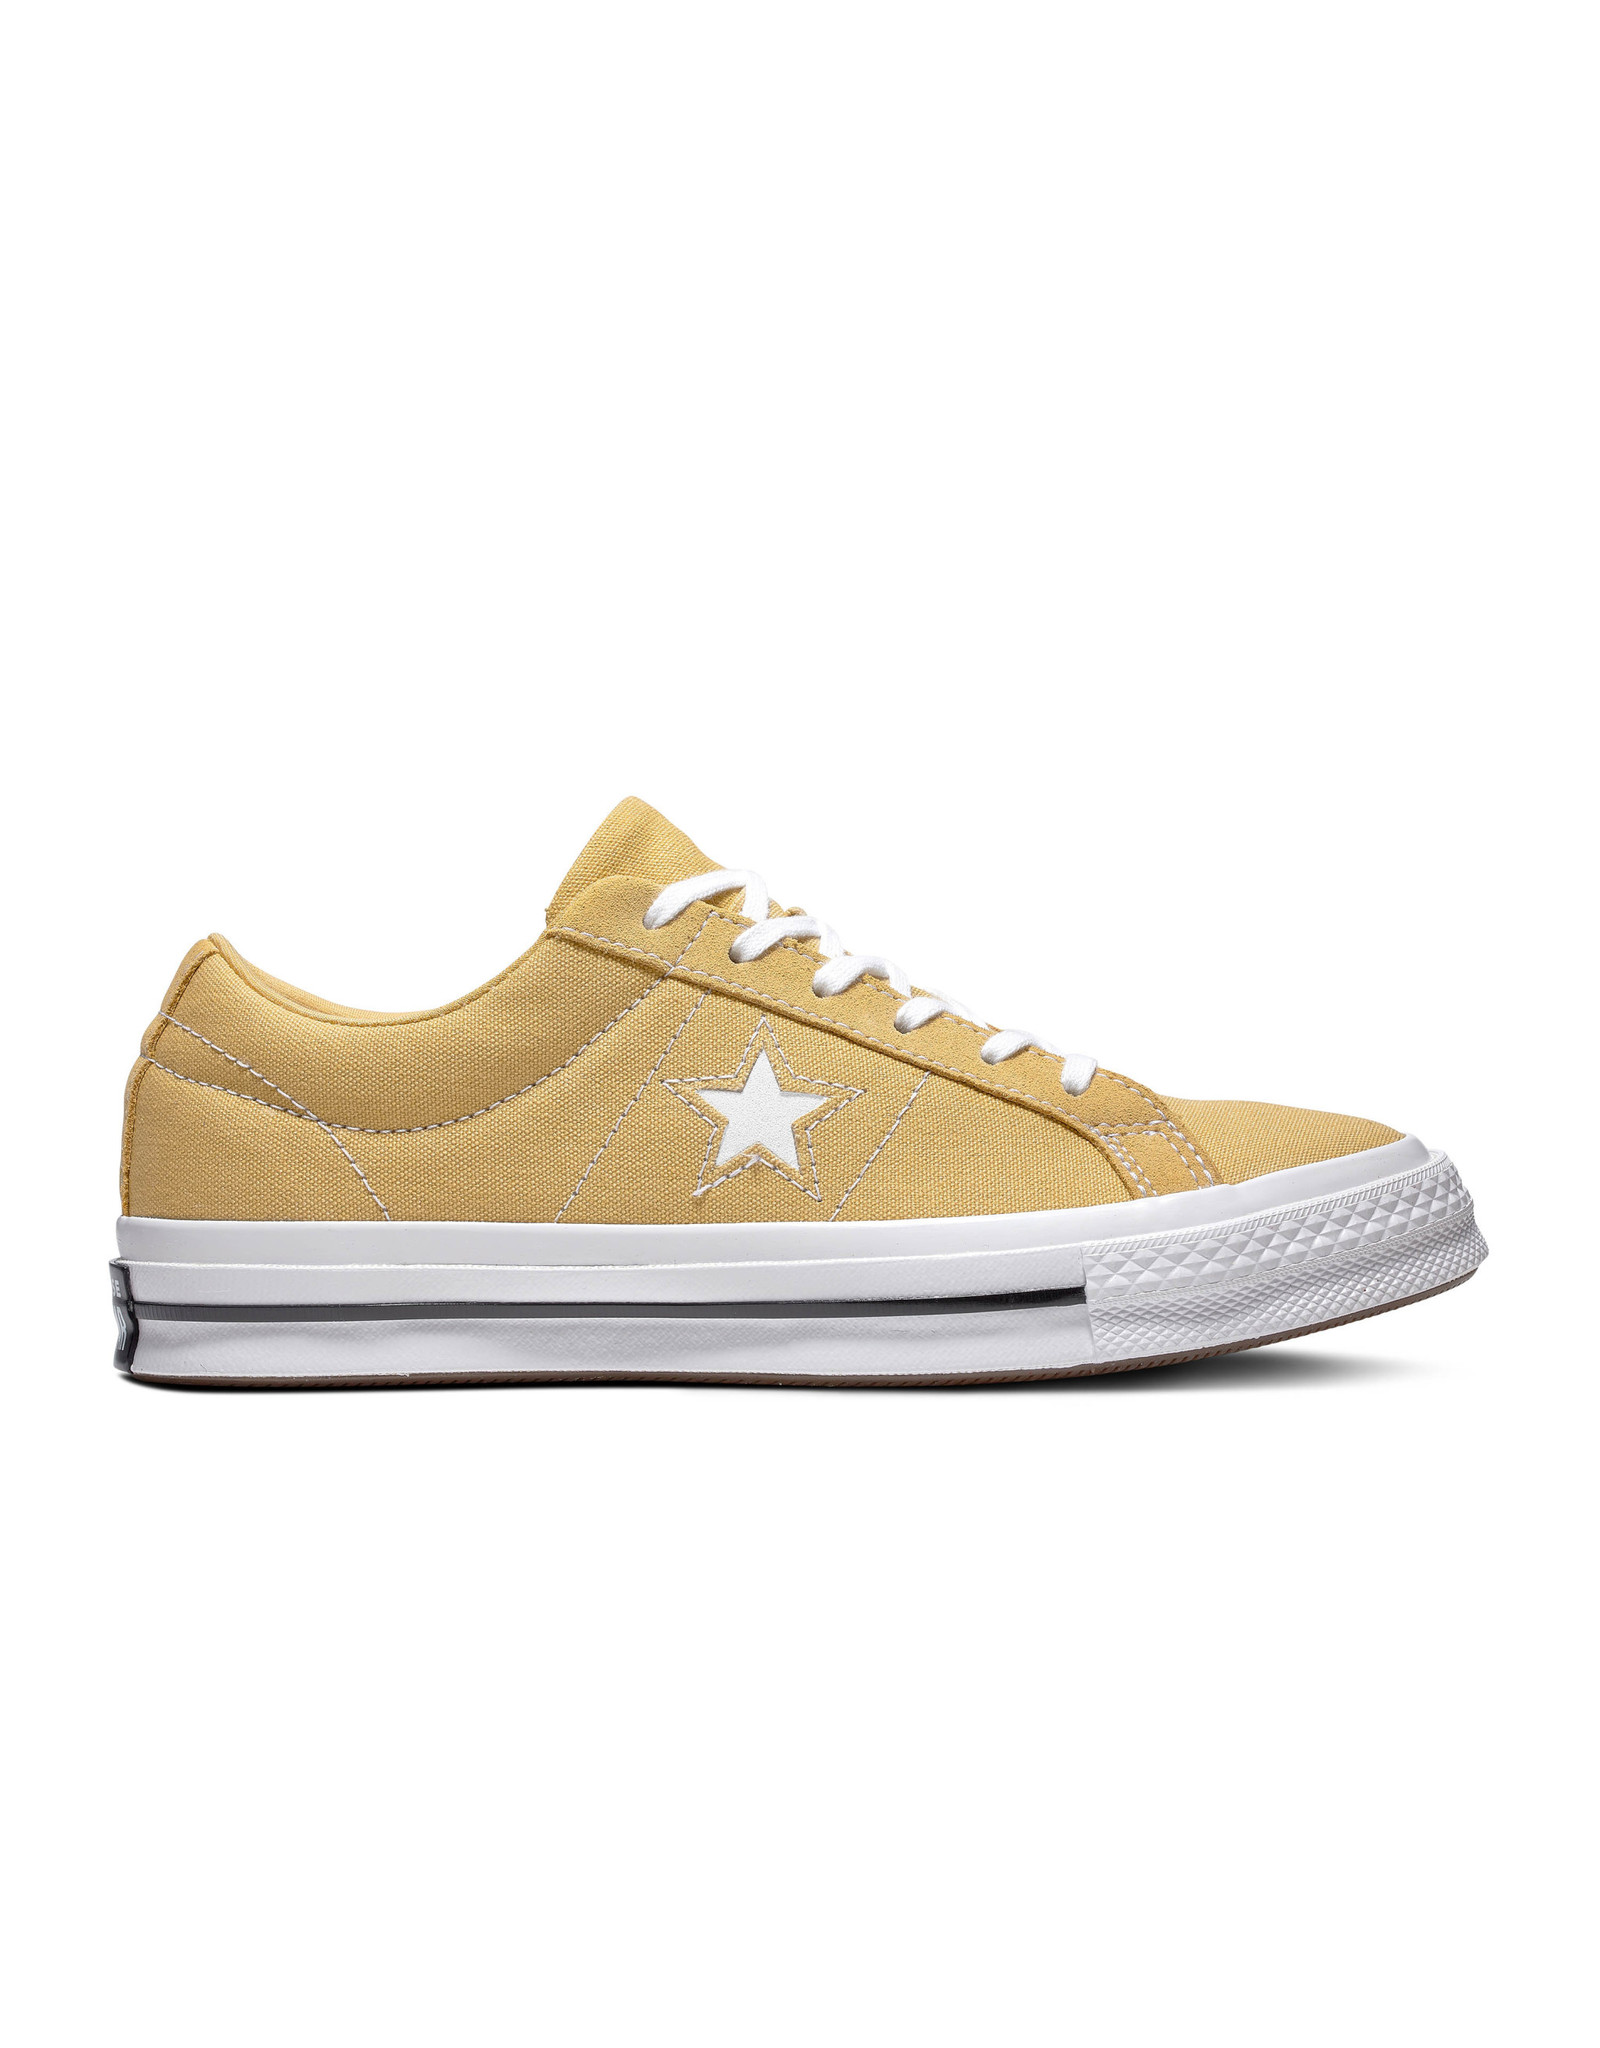 CONVERSE ONE STAR OX CLUB GOLD/WHITE/BLACK C987CL-163317C